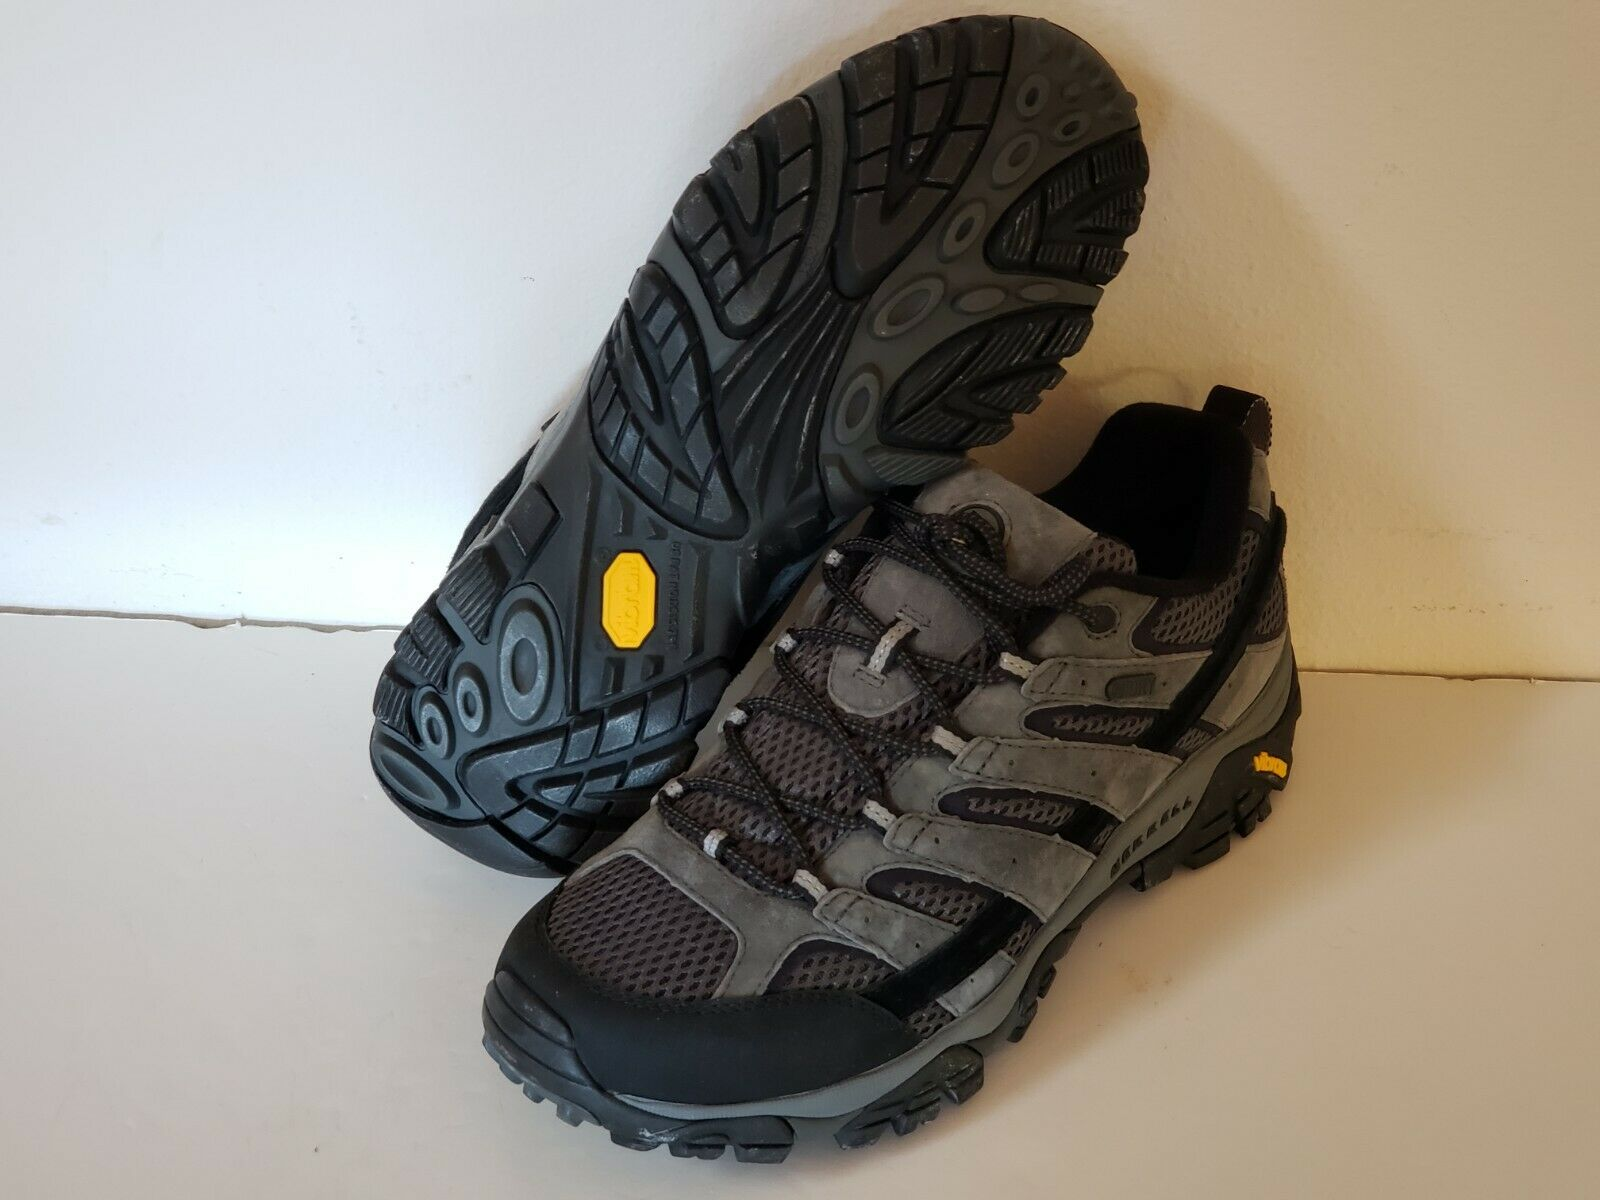 MM64 New Merrell Moab 2 WP Leather Trek Hiking Stiefel Sie 9 Charcoal Reg 120